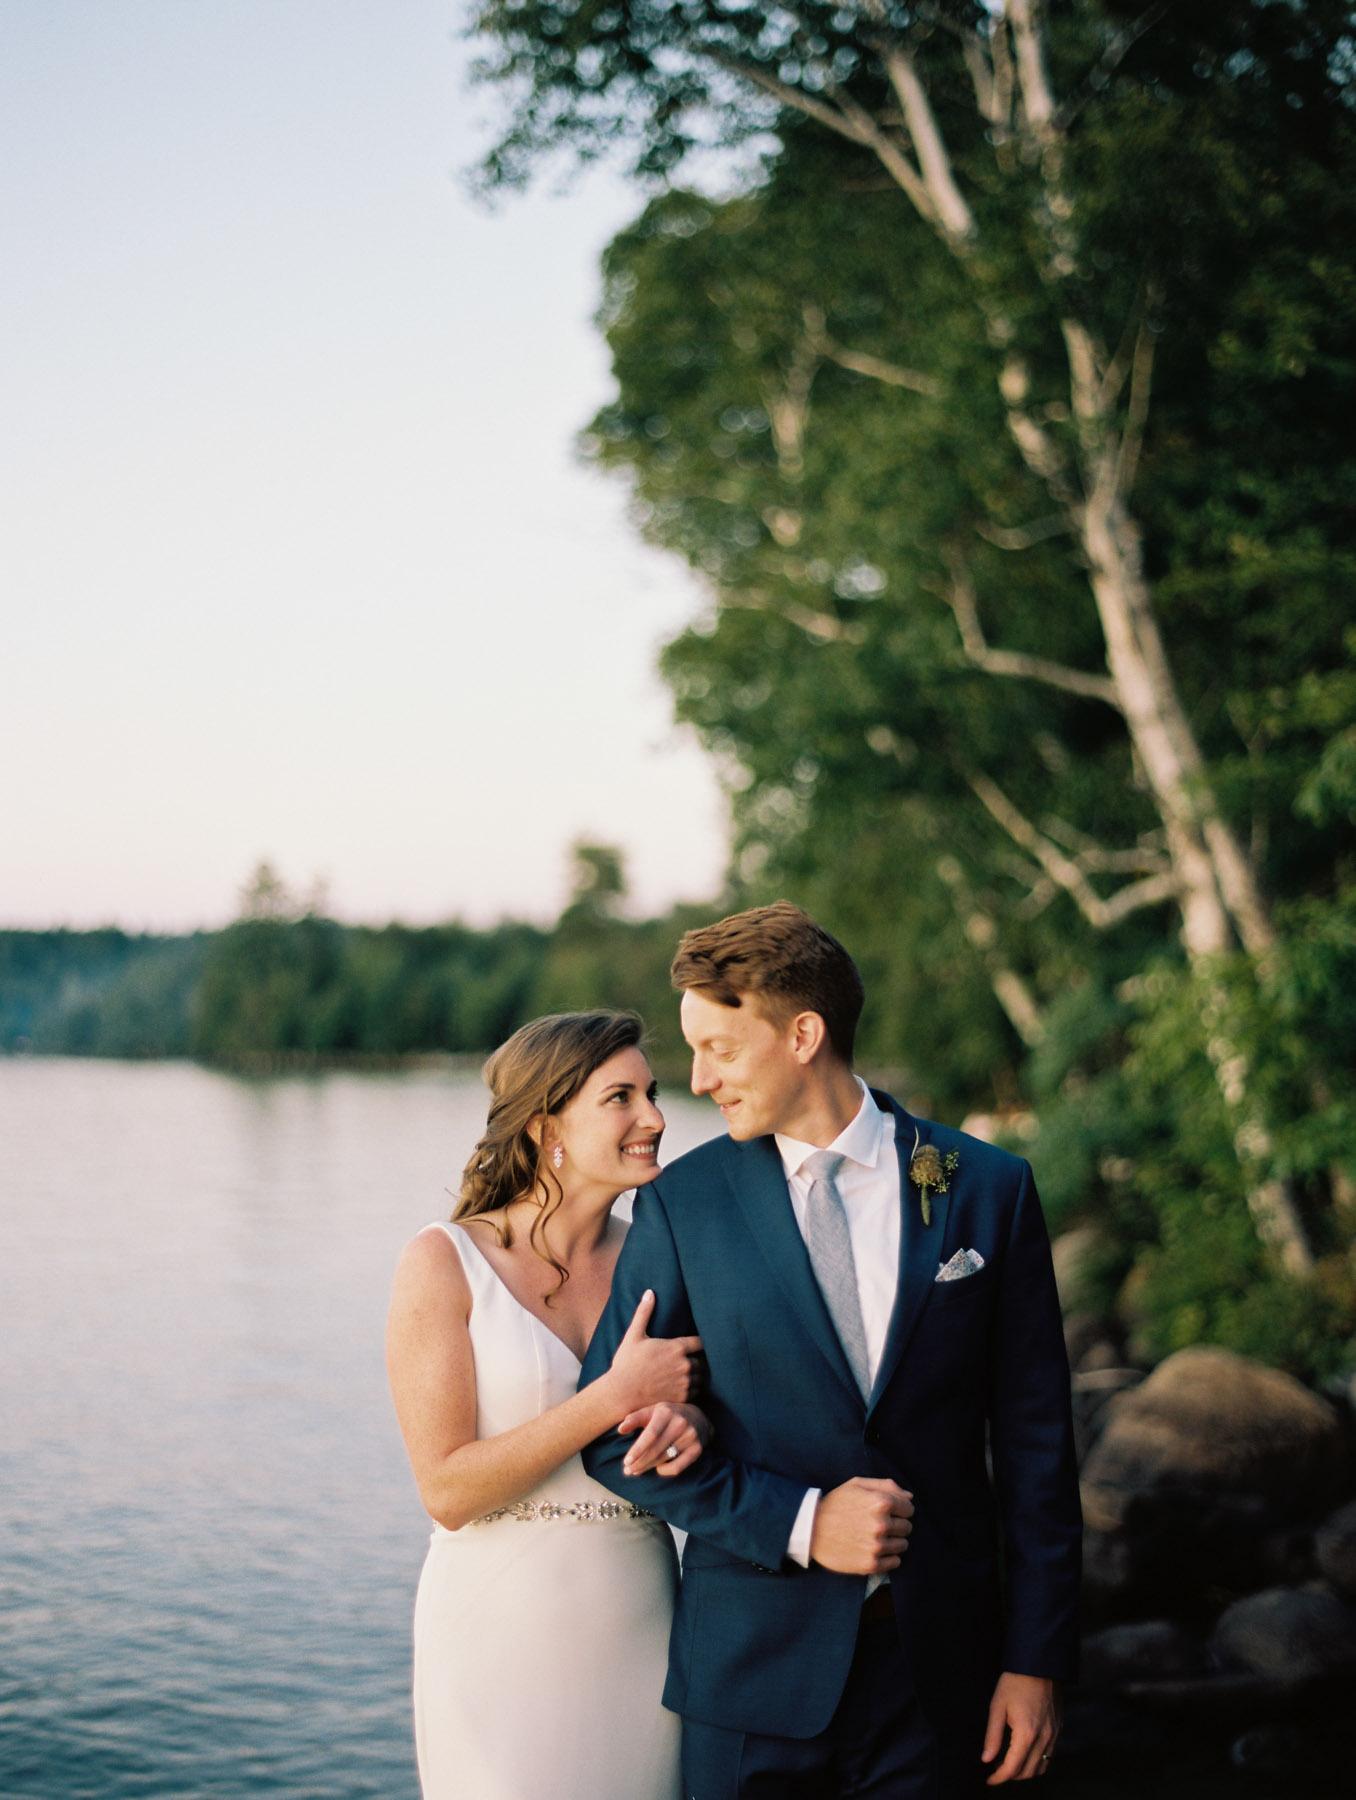 Wedding-Photography-Campground-29.jpg